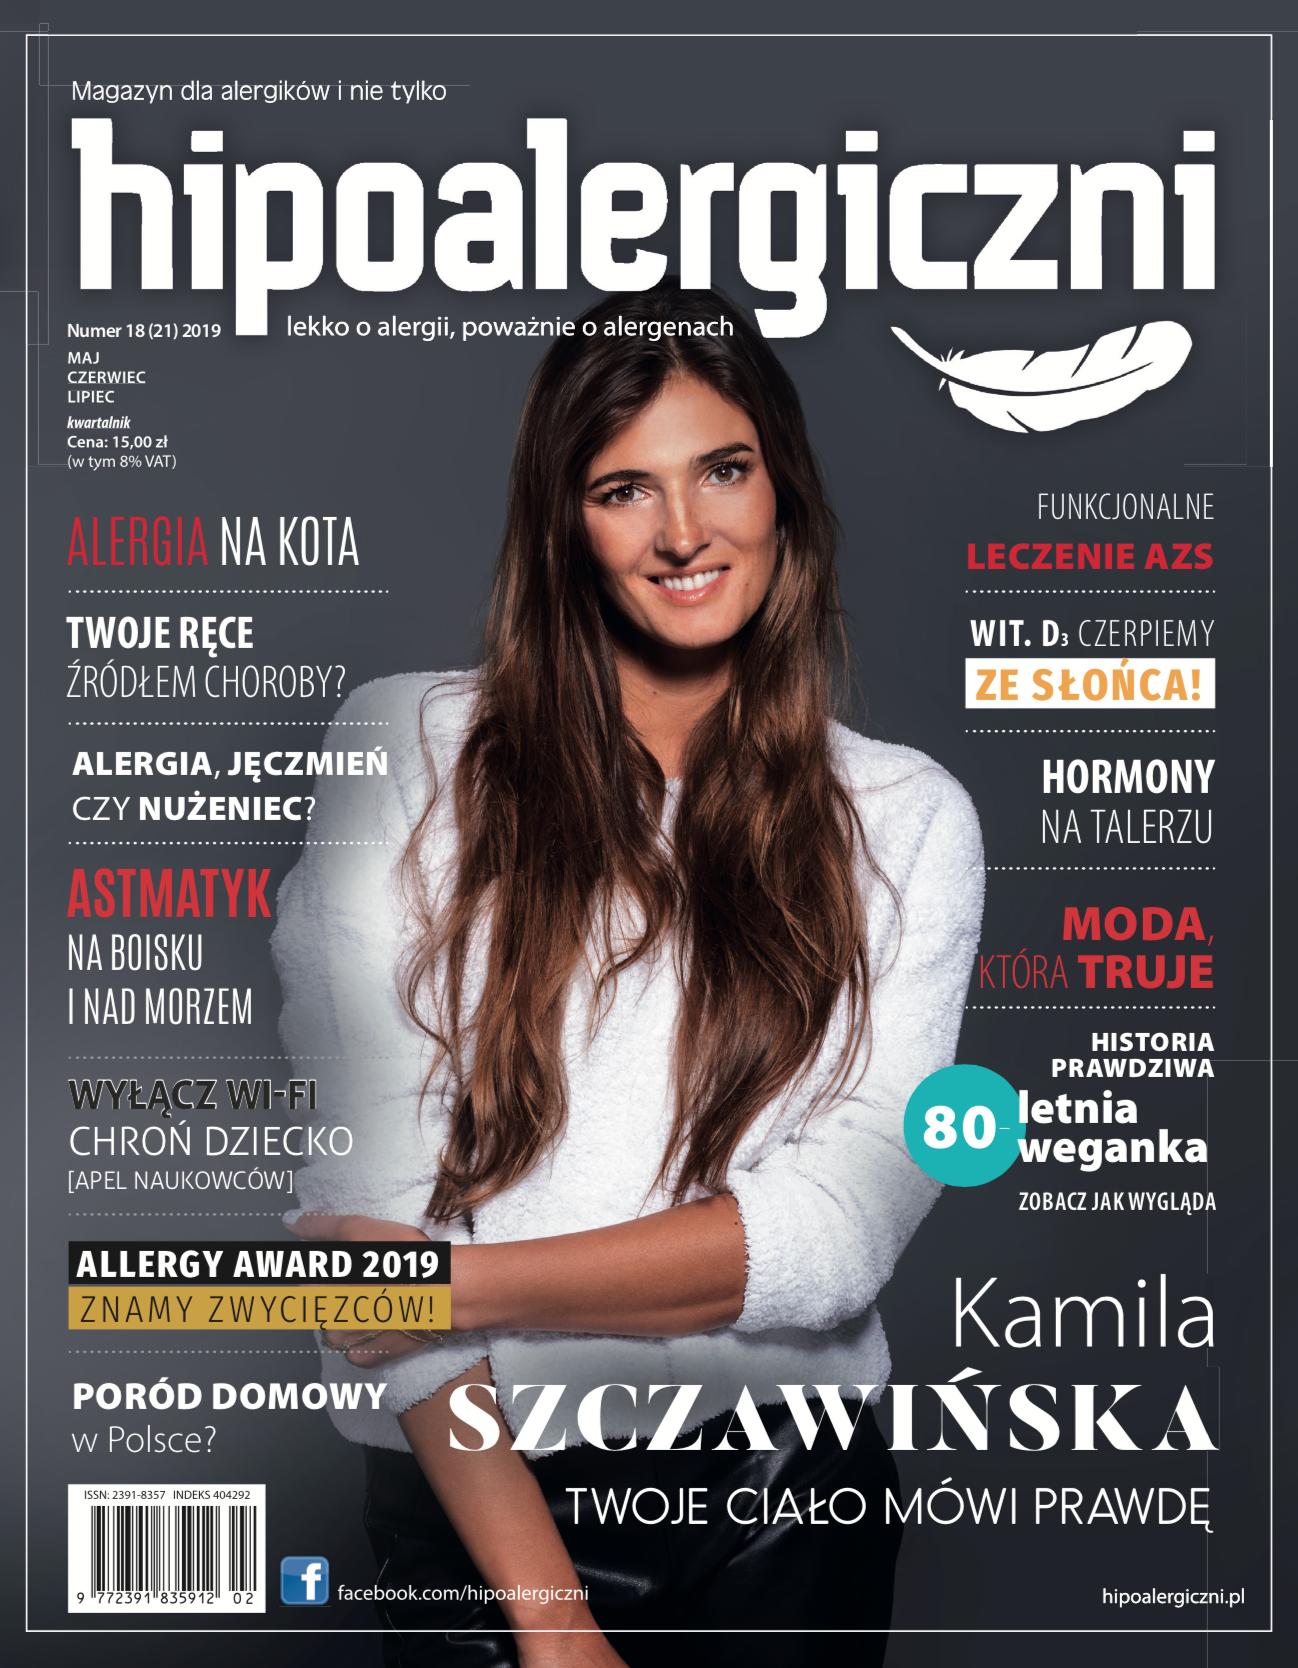 Magazyn Hipoalergiczni_2019_05_Kamila